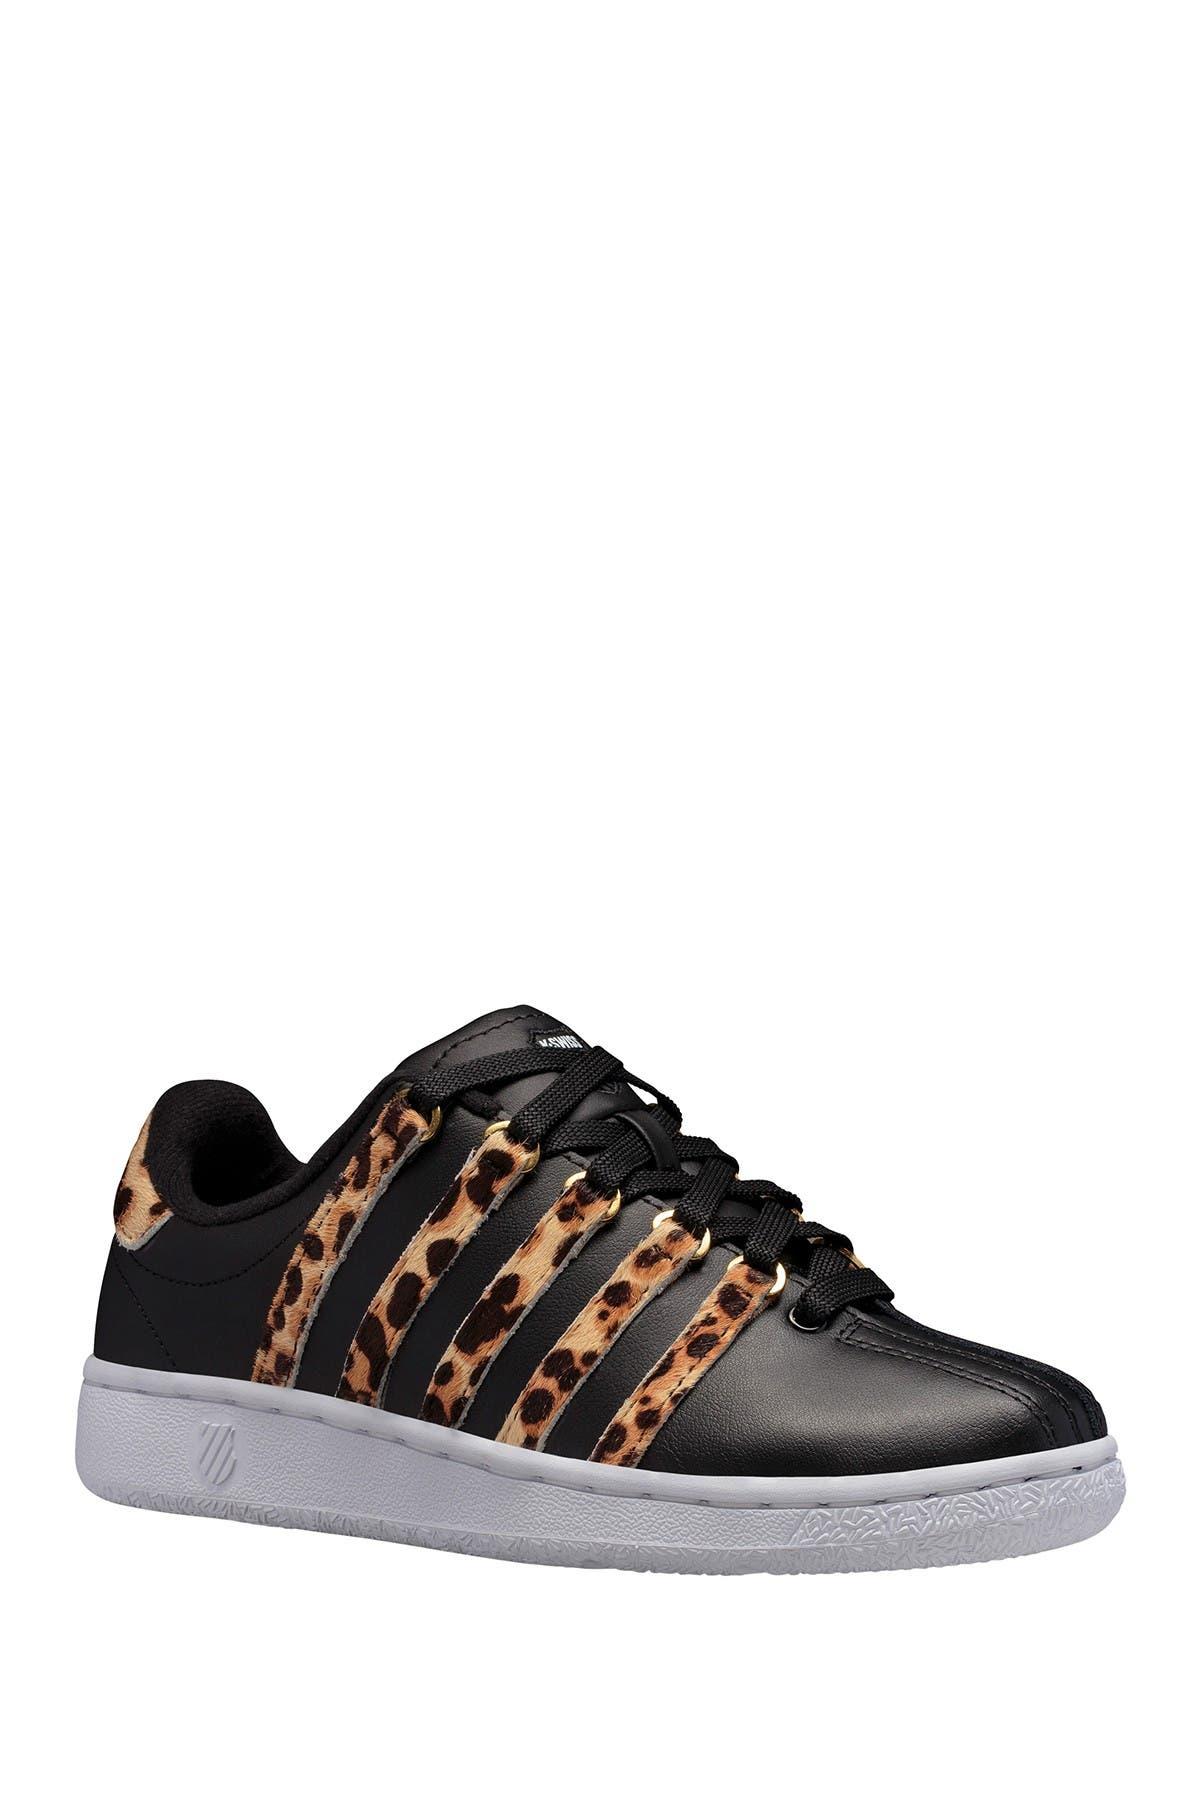 Image of K-Swiss Classic VN Premium Sneaker